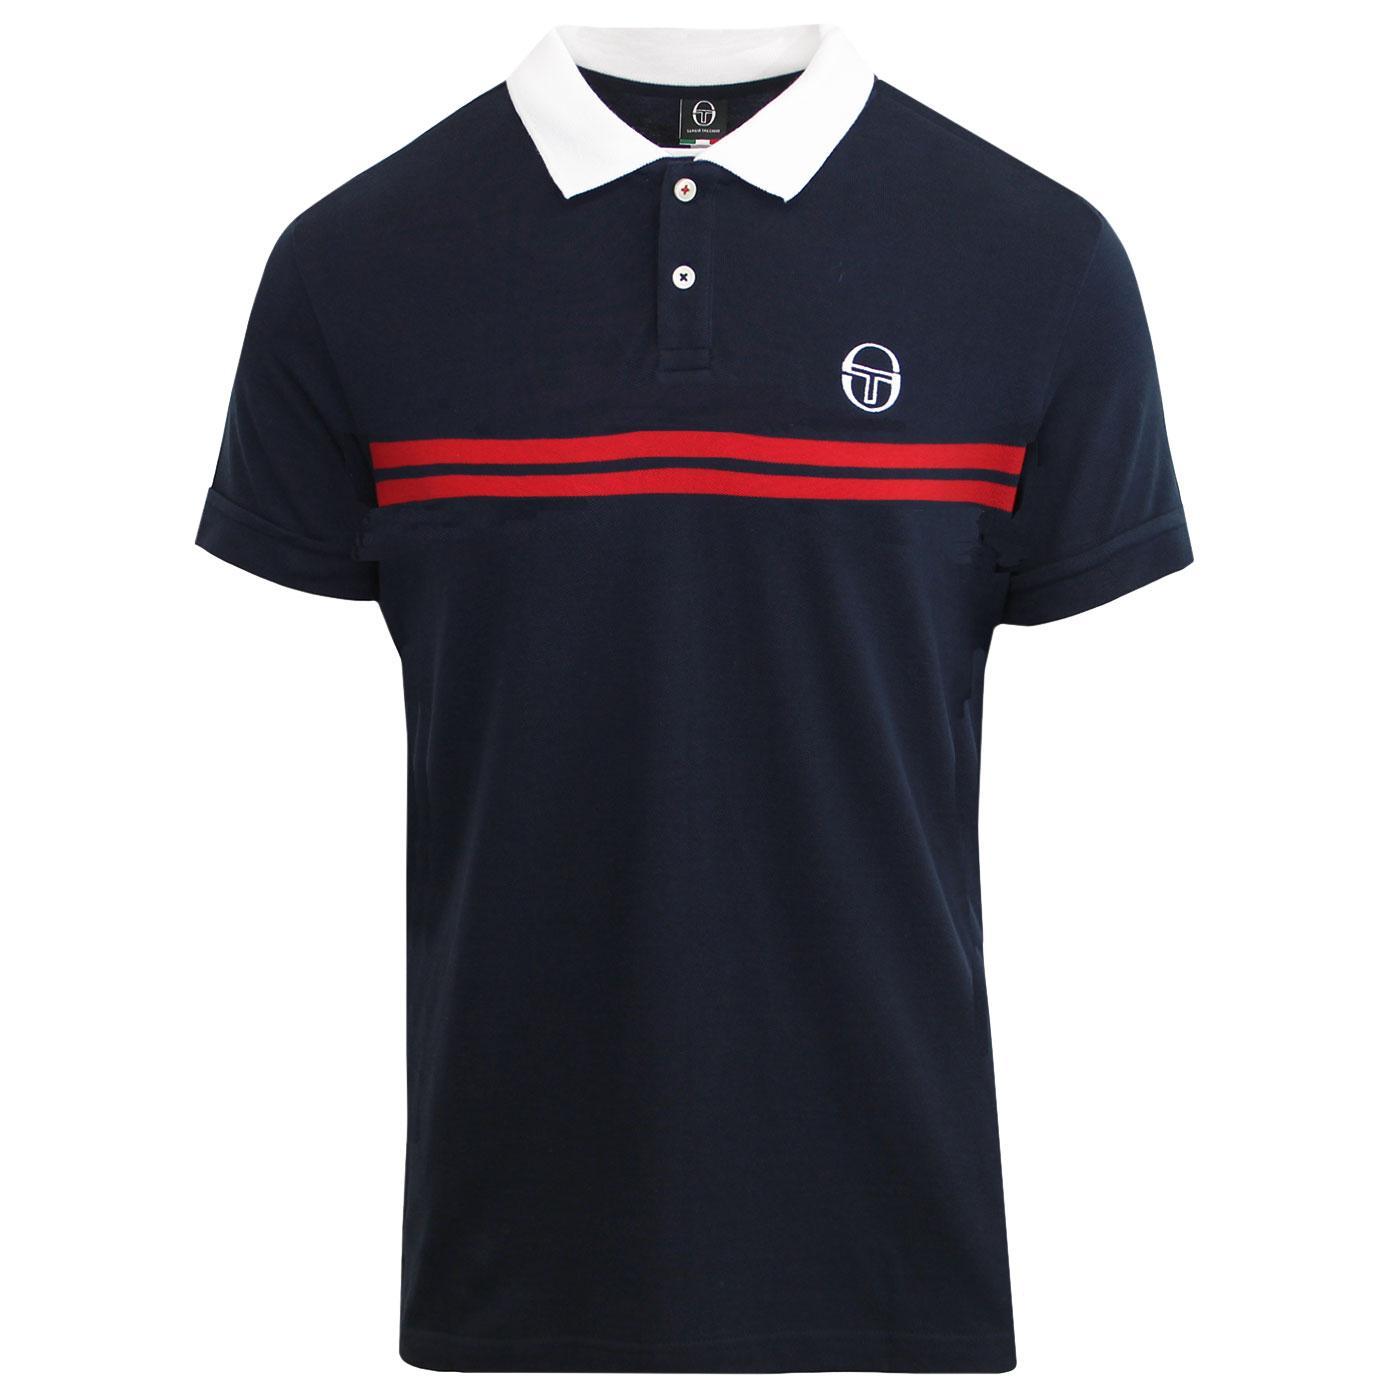 Supermac SERGIO TACCHINI Retro 80s Polo Shirt NAVY